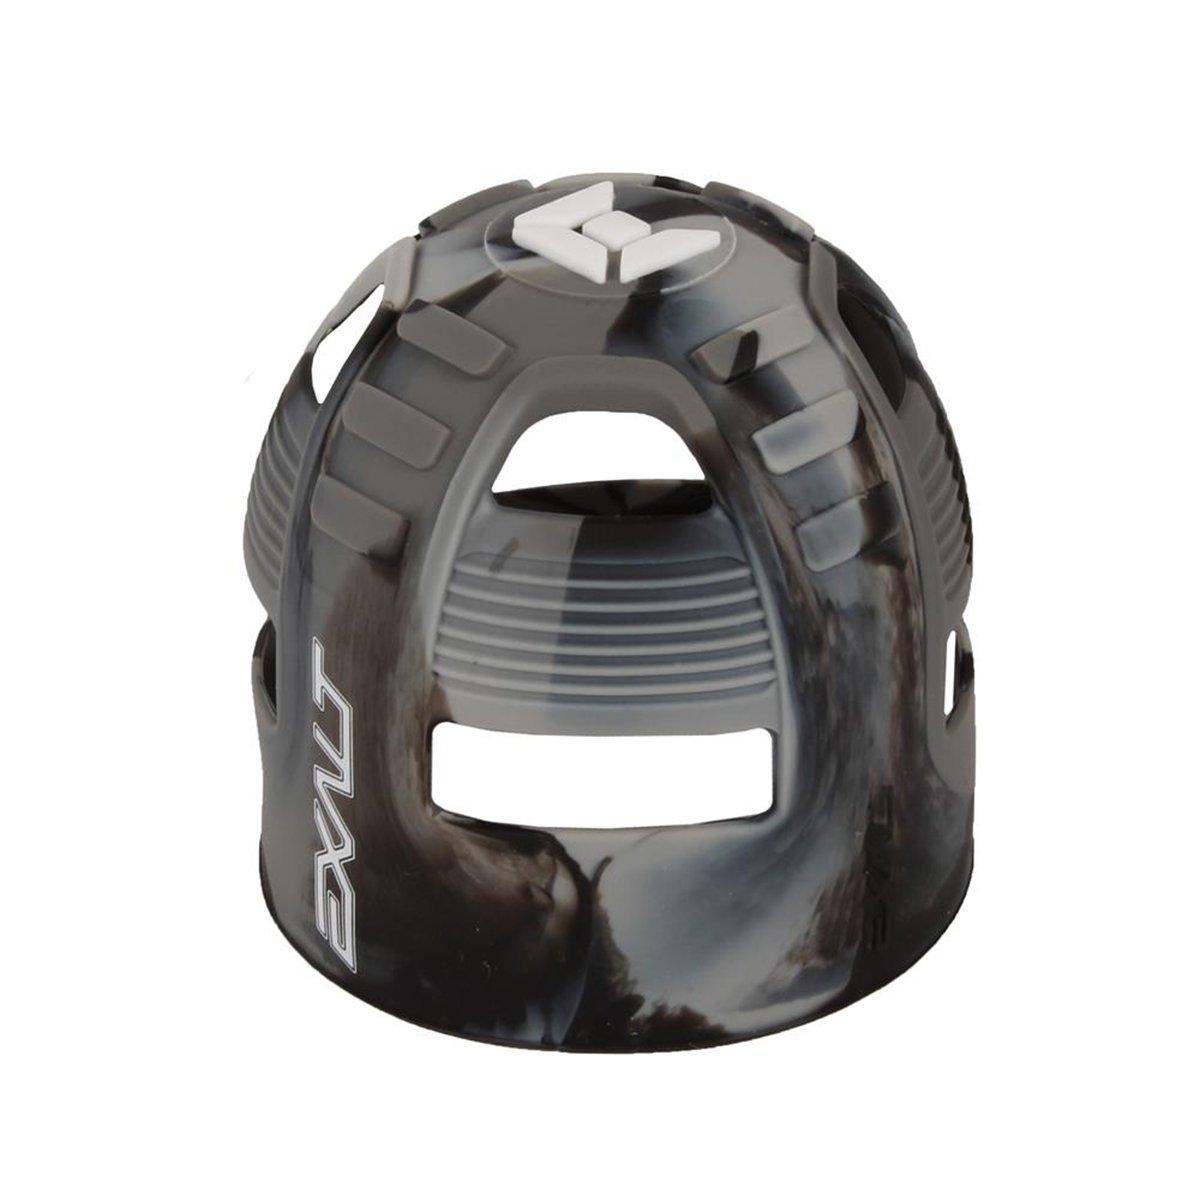 Exalt Paintball Tank Grip - 45-88ci - Charcoal Swirl by Exalt